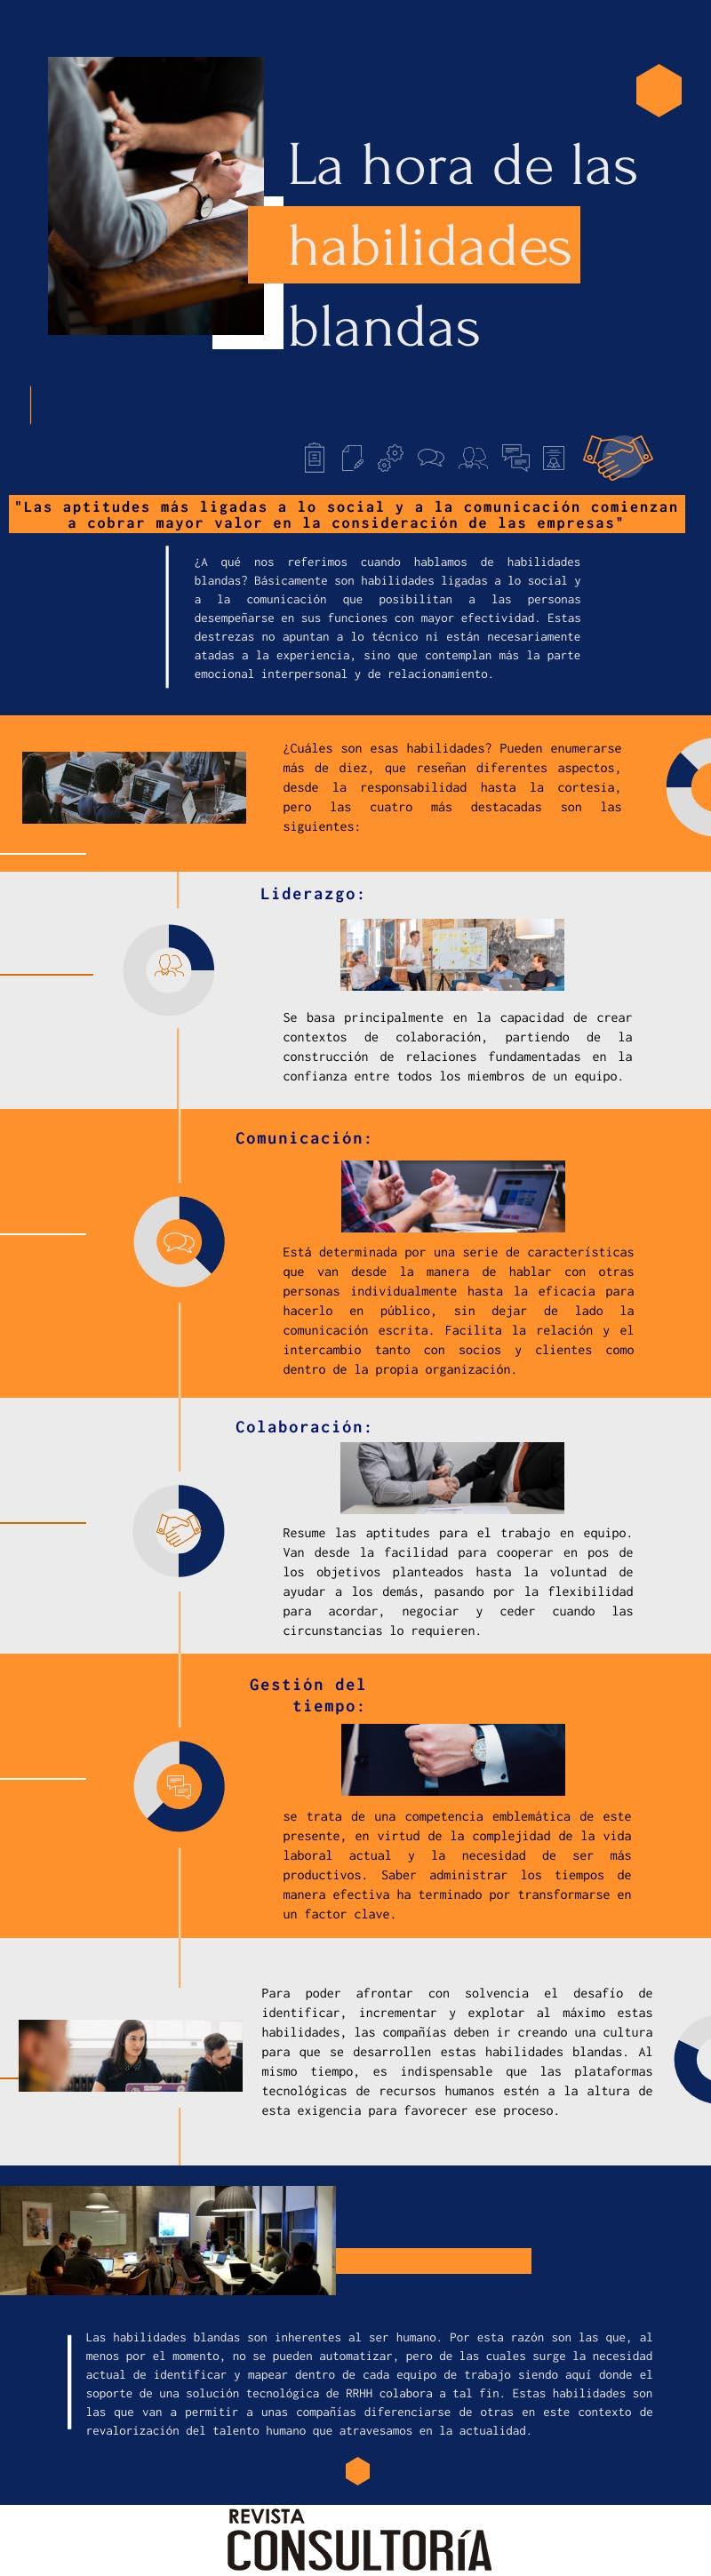 infografia 26 nov - La hora de las habilidades blandas